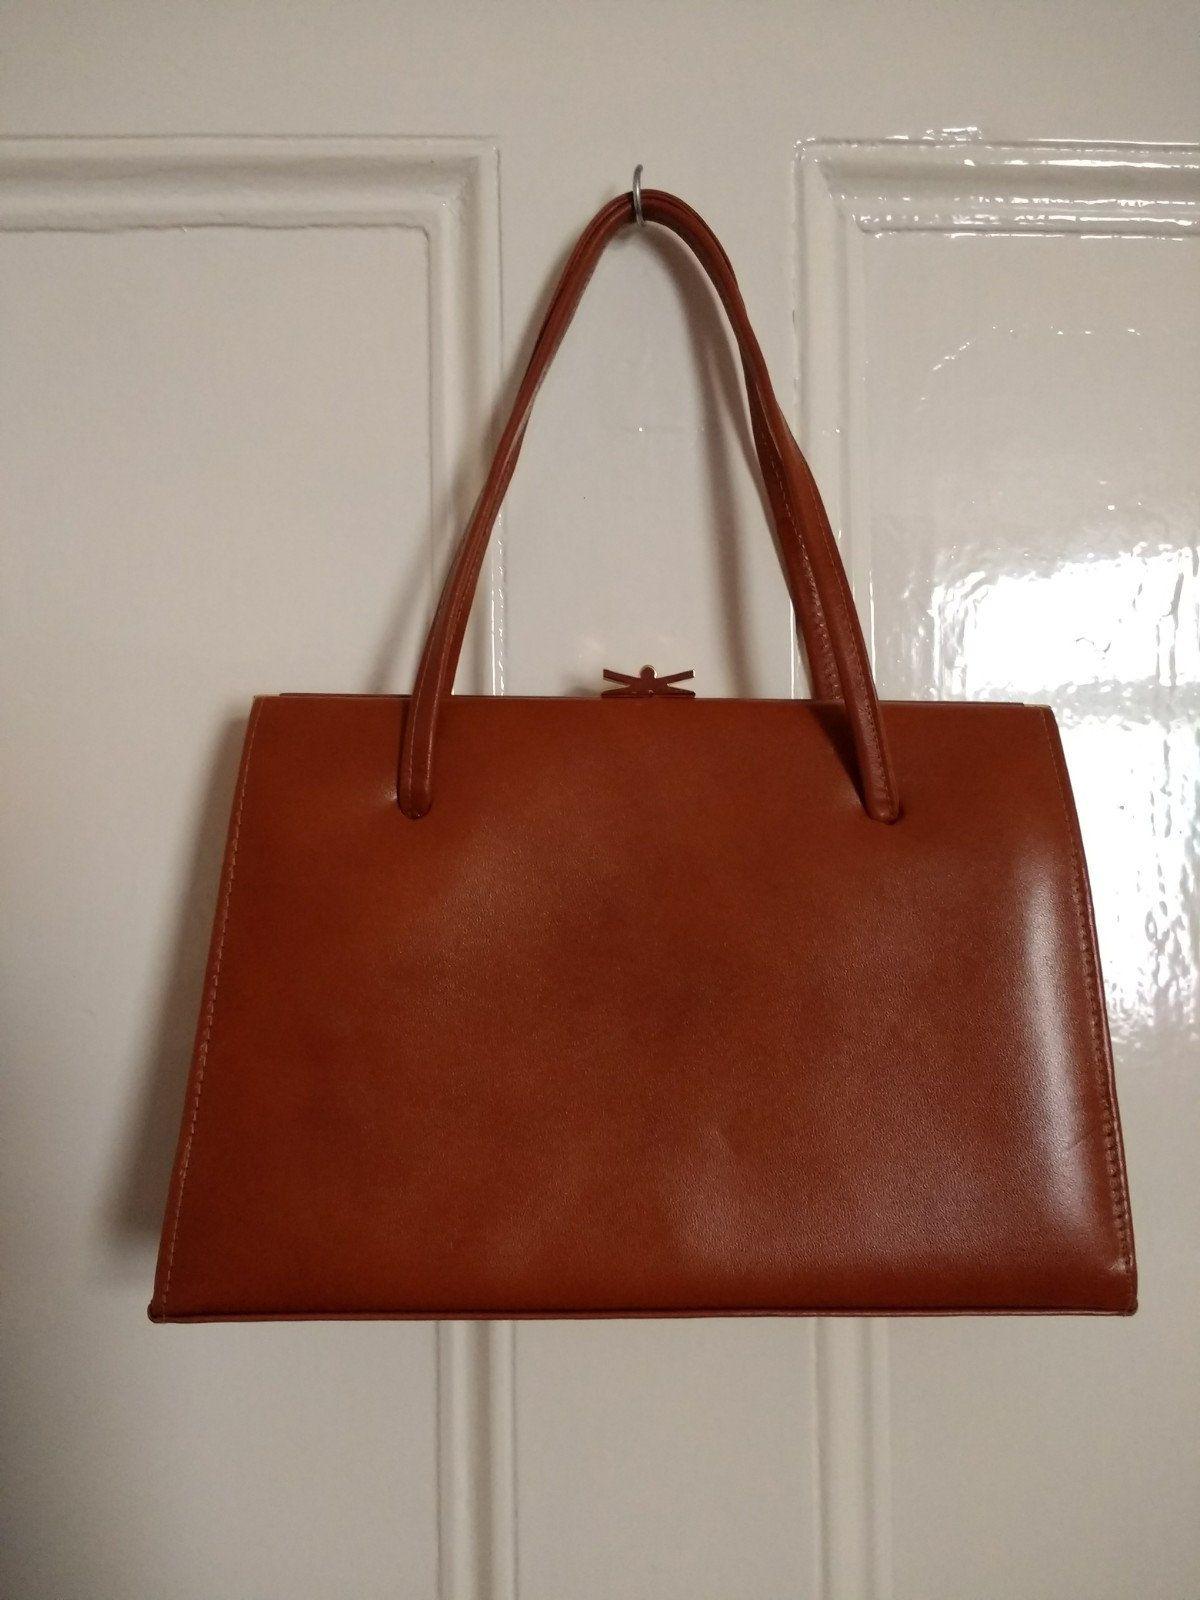 Vintage Ackery Of London Tan Leather Handbag